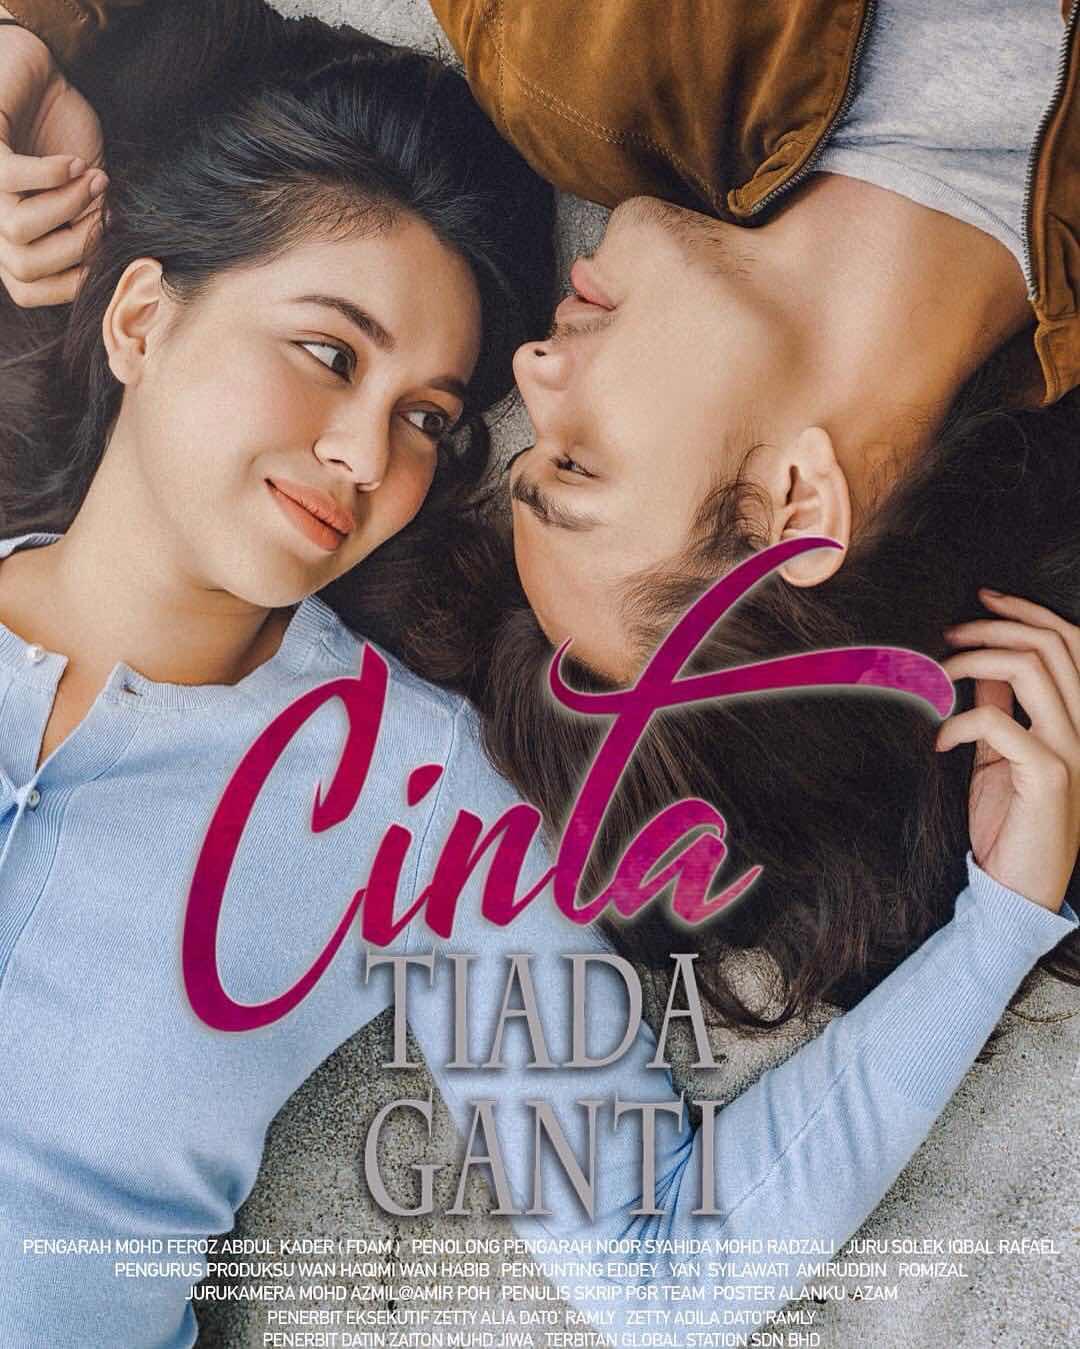 %255BUNSET%255D - Sinopsis Drama Cinta Tiada Ganti (Tiara, Astro Prima)